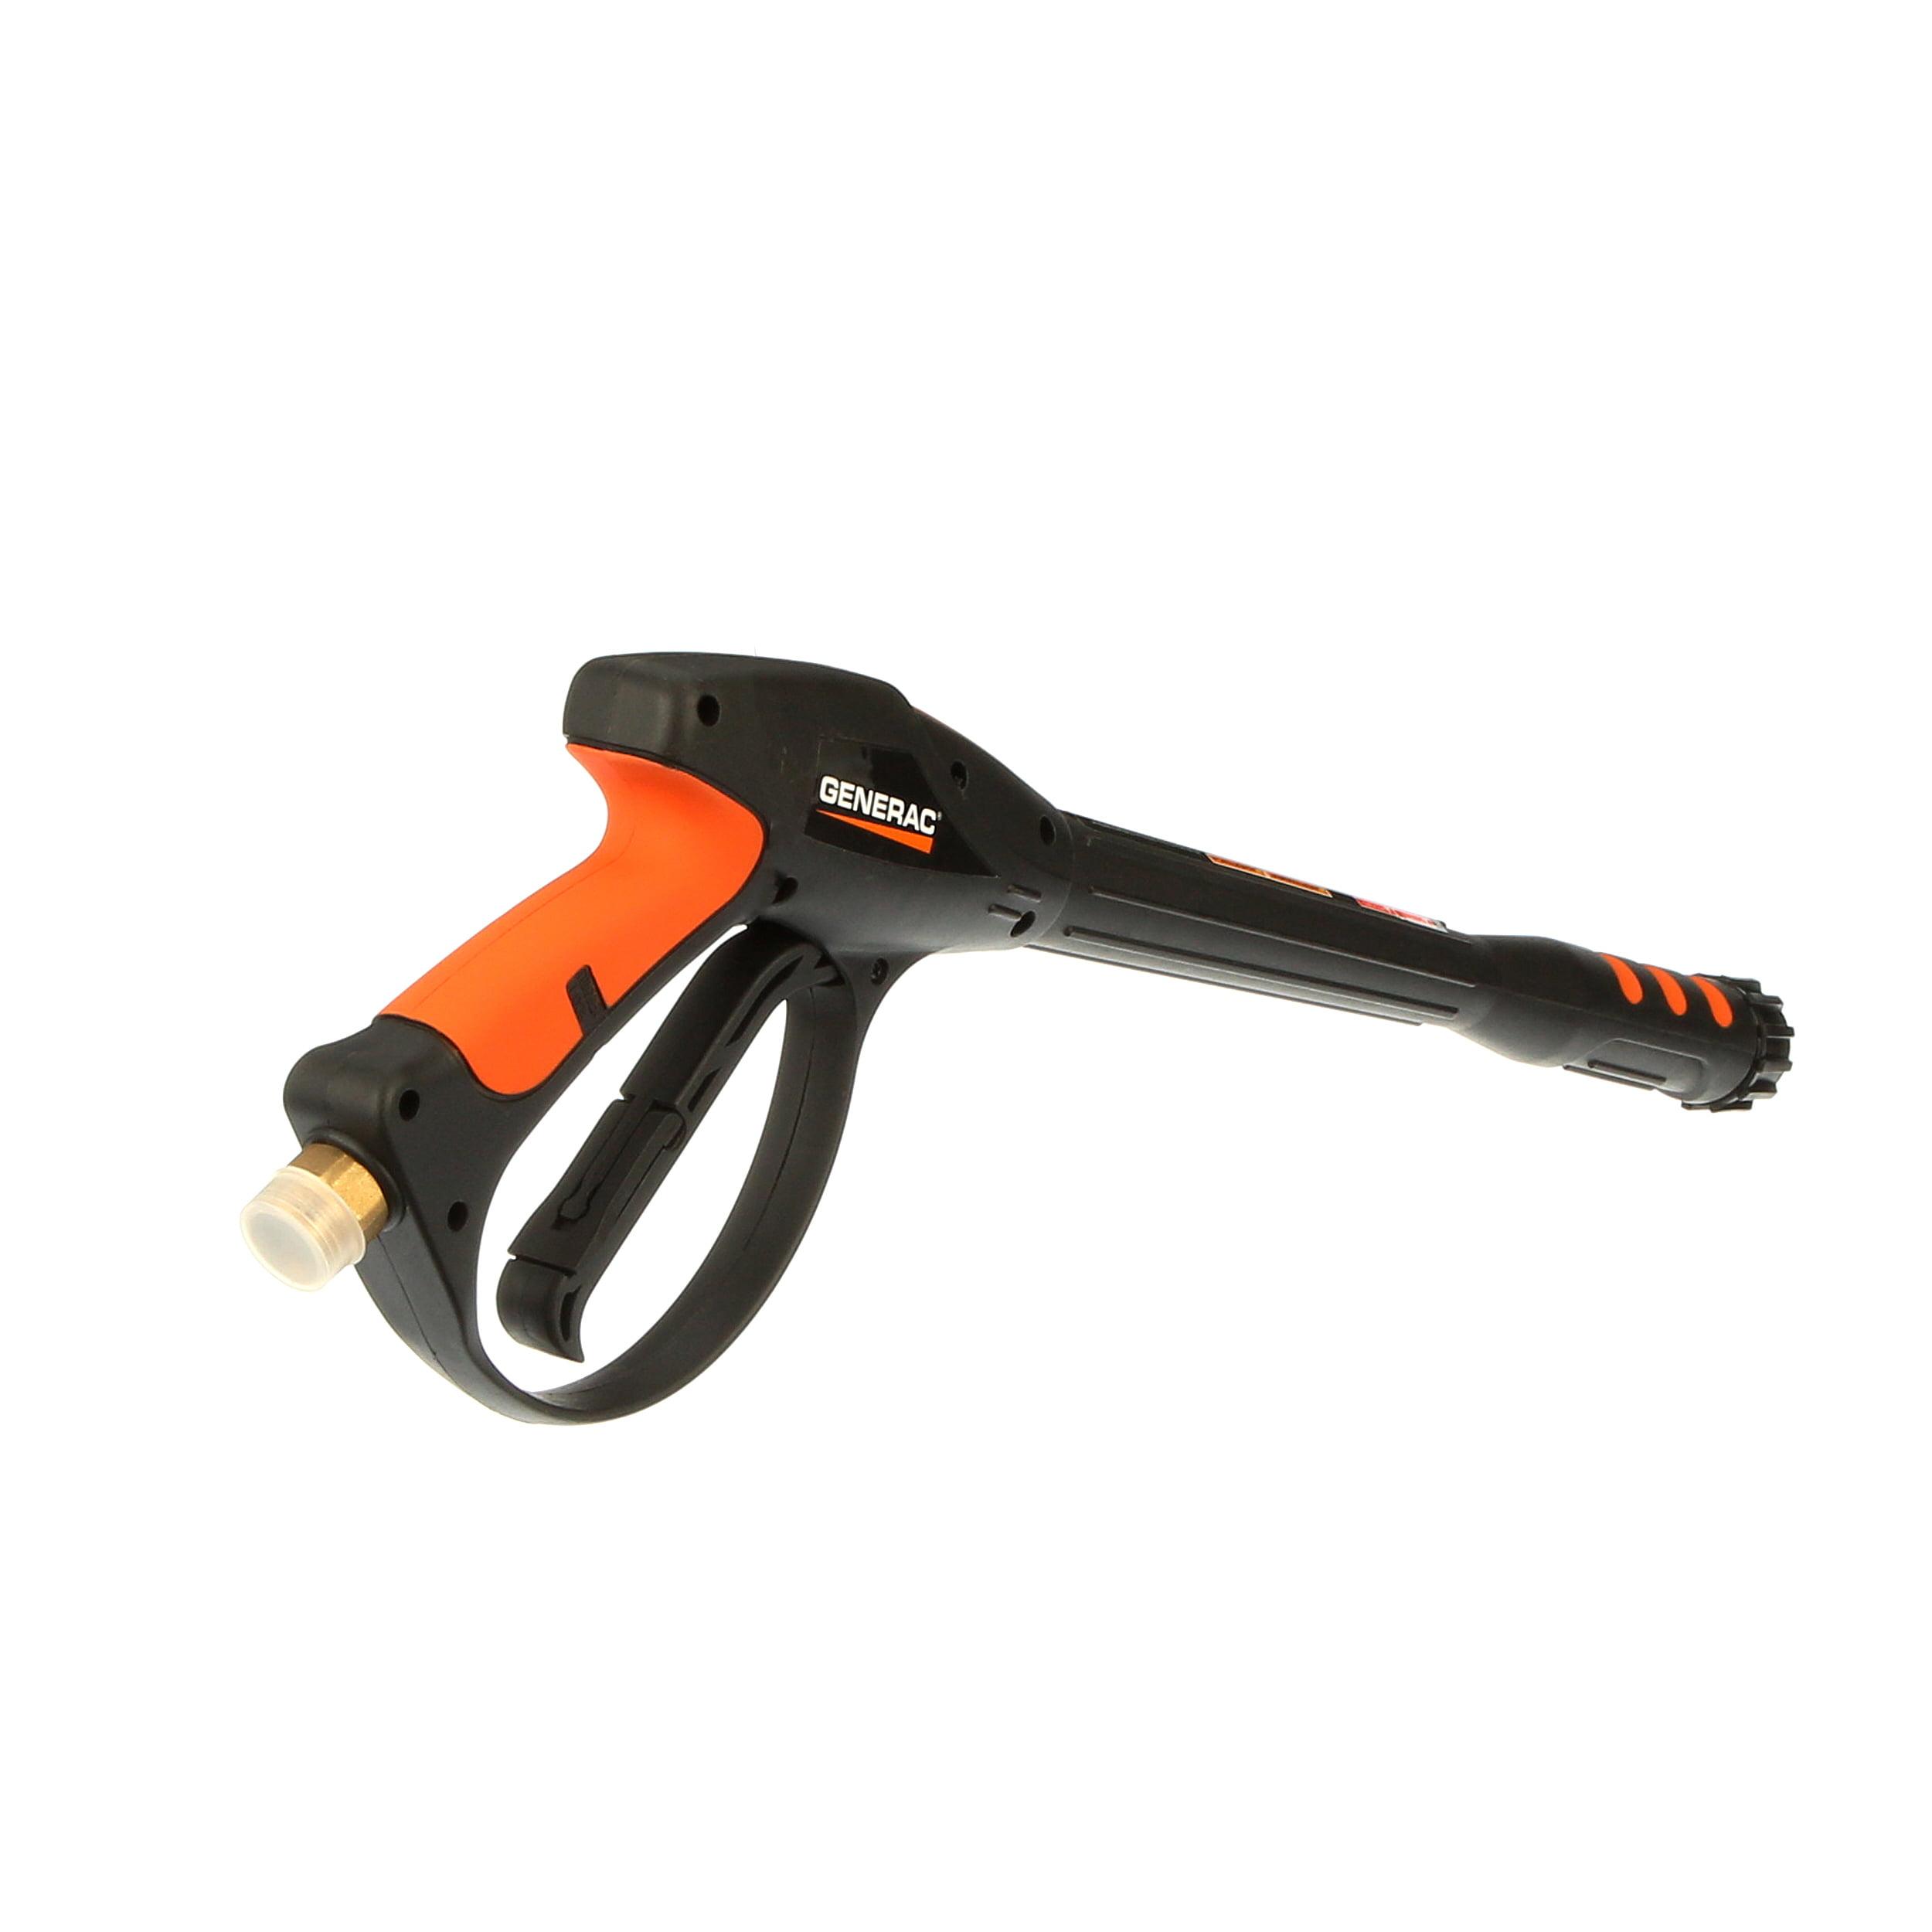 Pressure Washer Gun >> Generac 3000 Psi Pressure Washer Gun Walmart Com